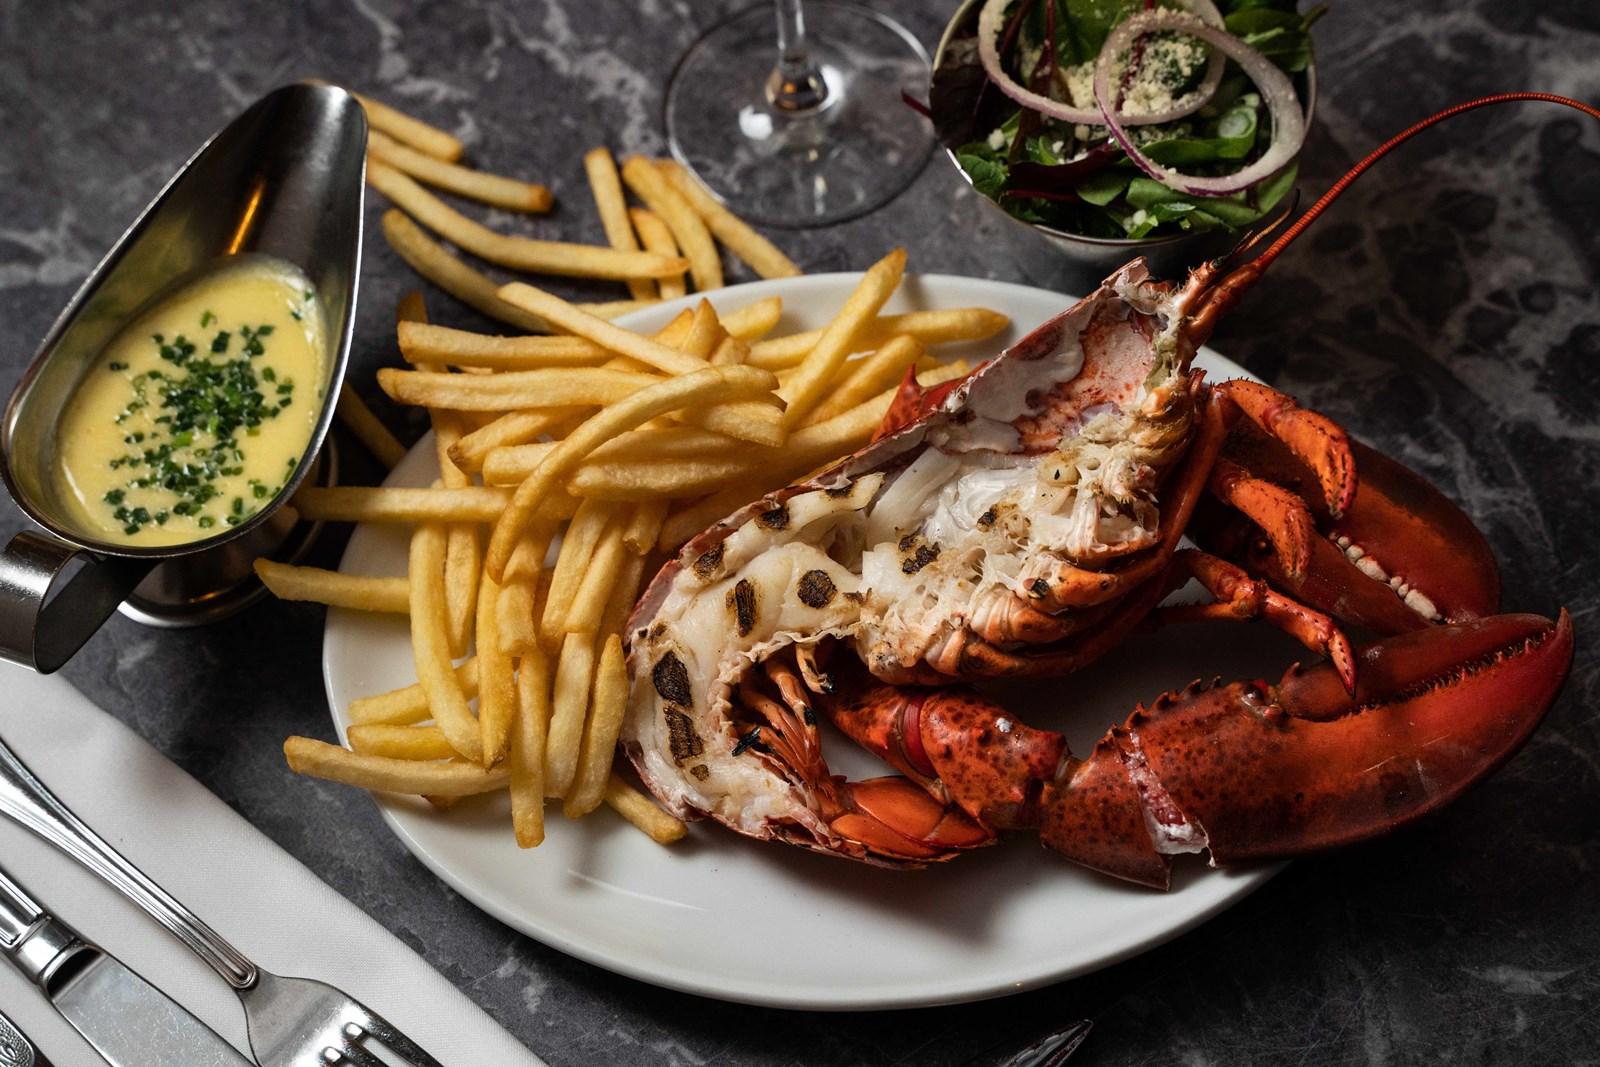 Best Restaurant In Knightsbridge London | Burger & Lobster